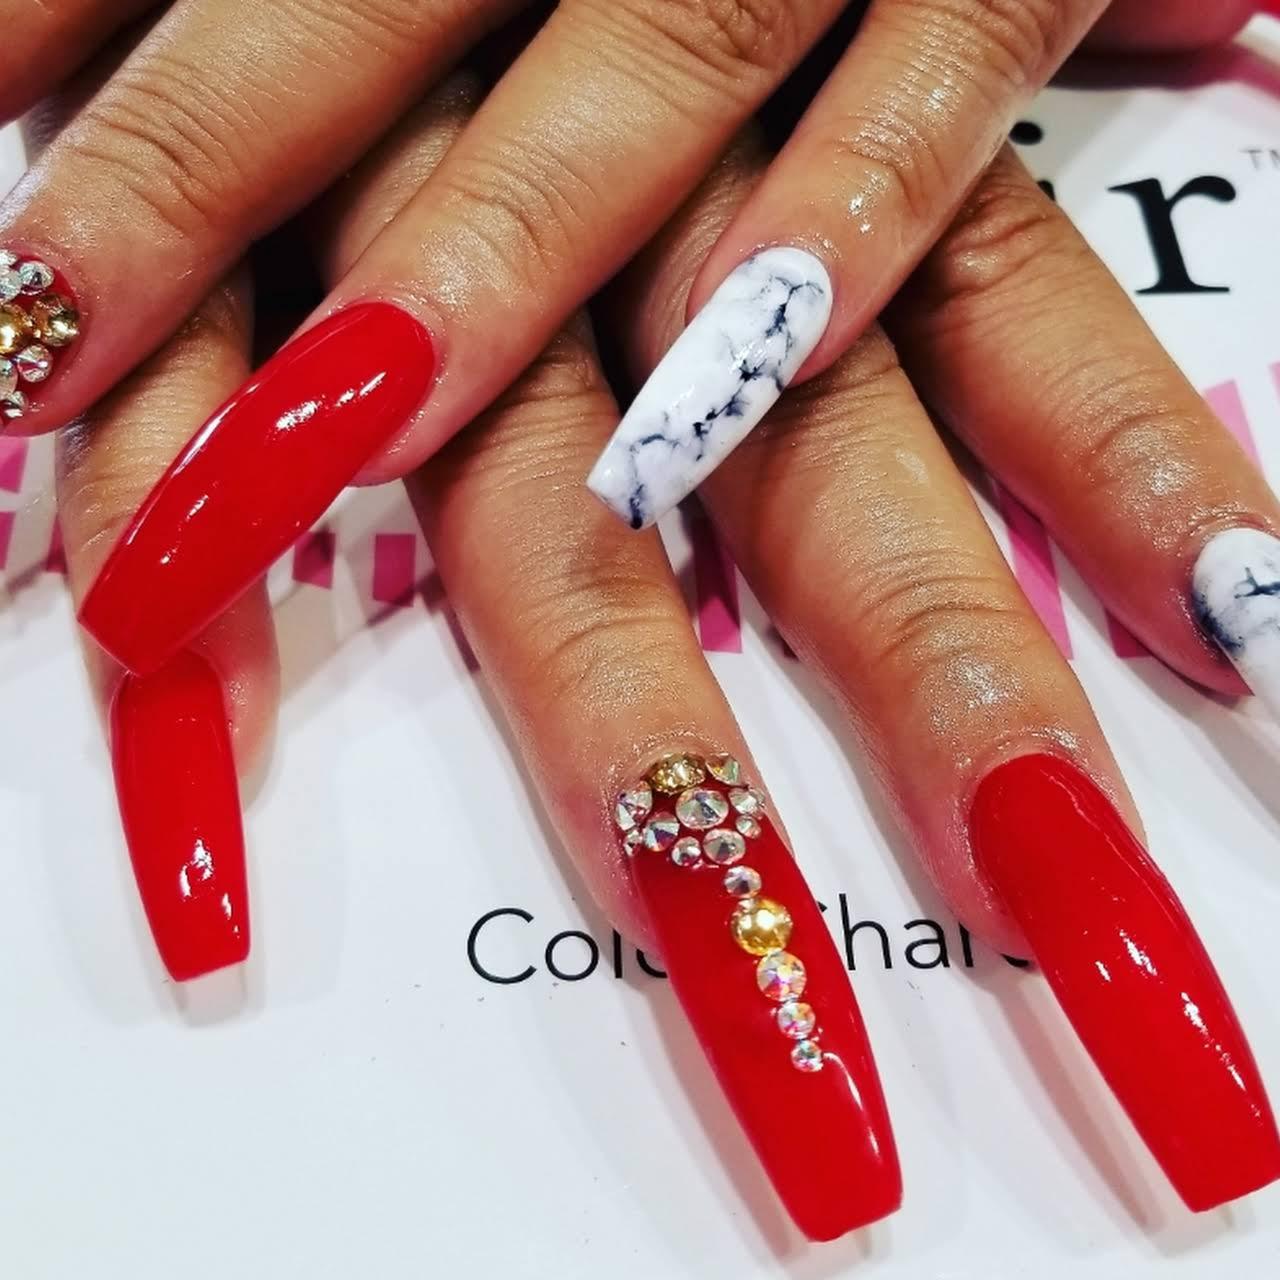 Kim\'s Beauty Nails - Nail Salon in El Cajon